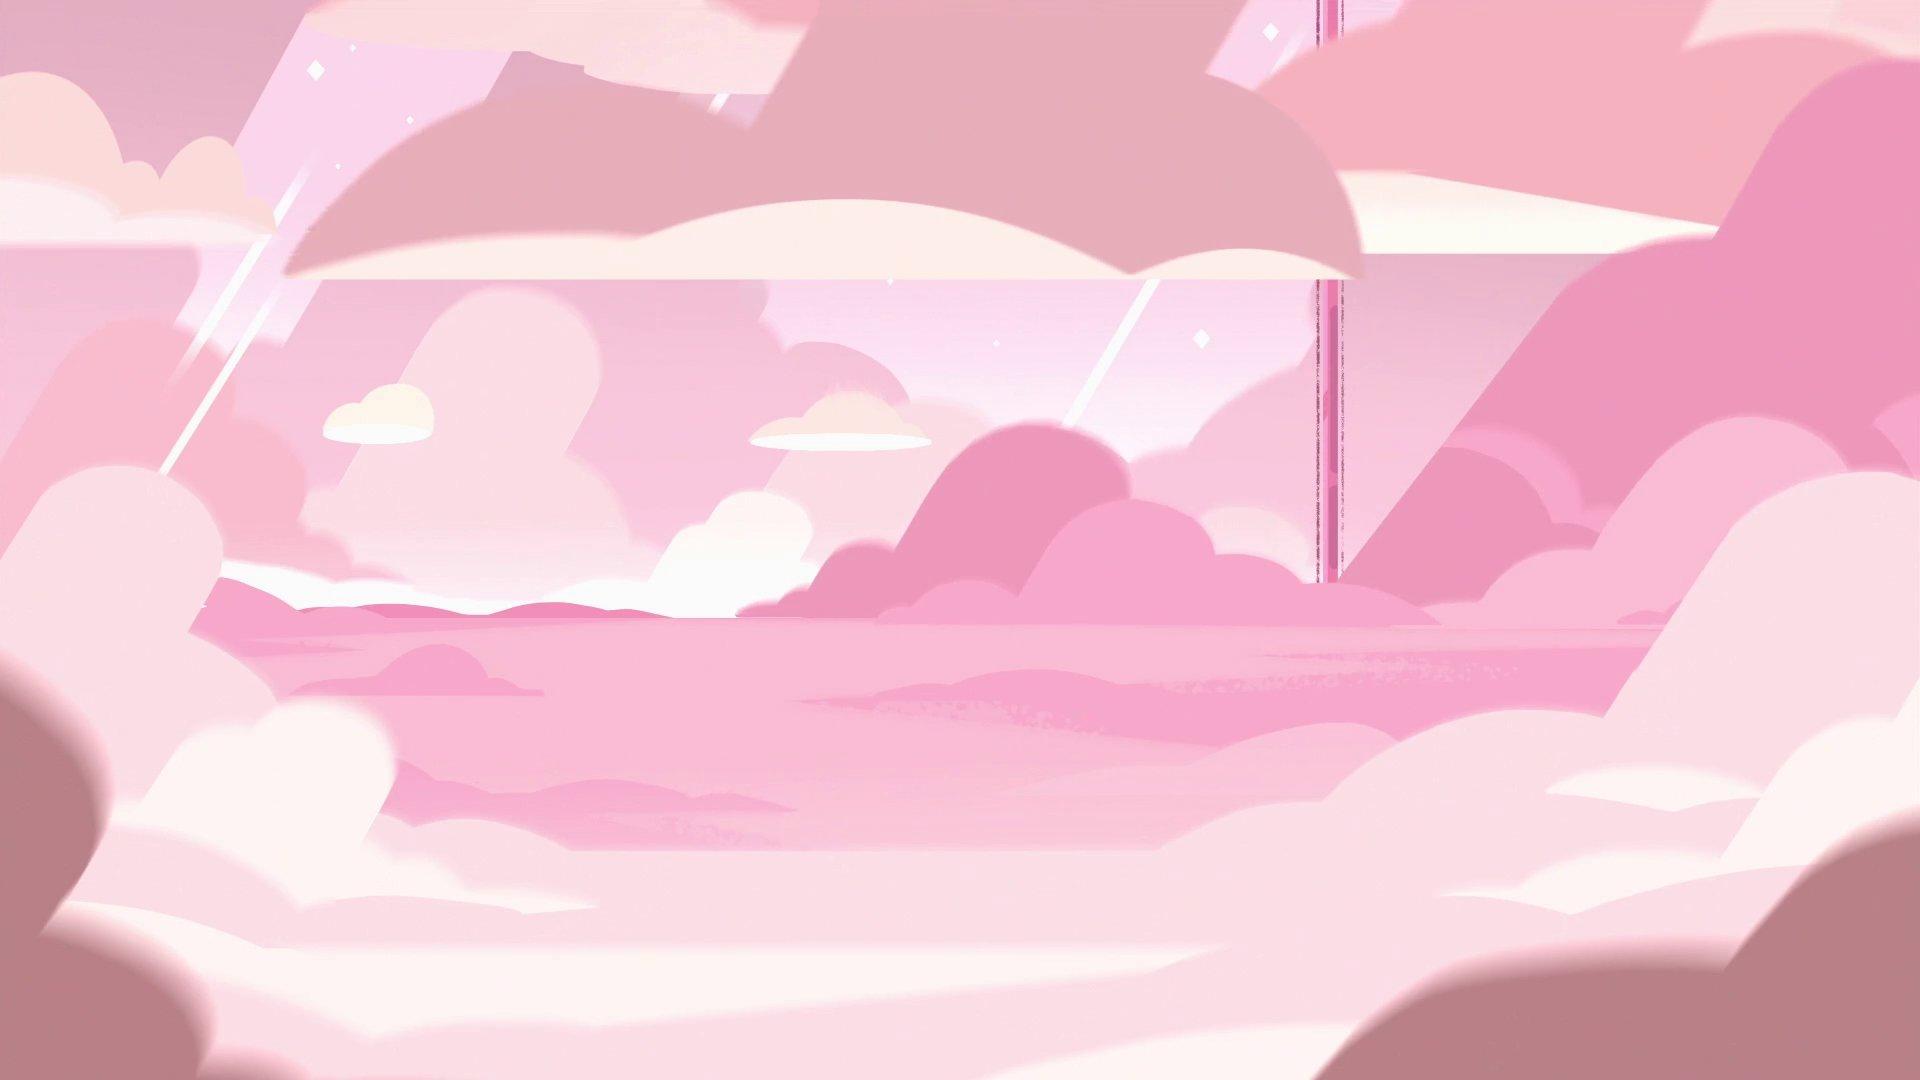 Steven Universe Wallpaper Download